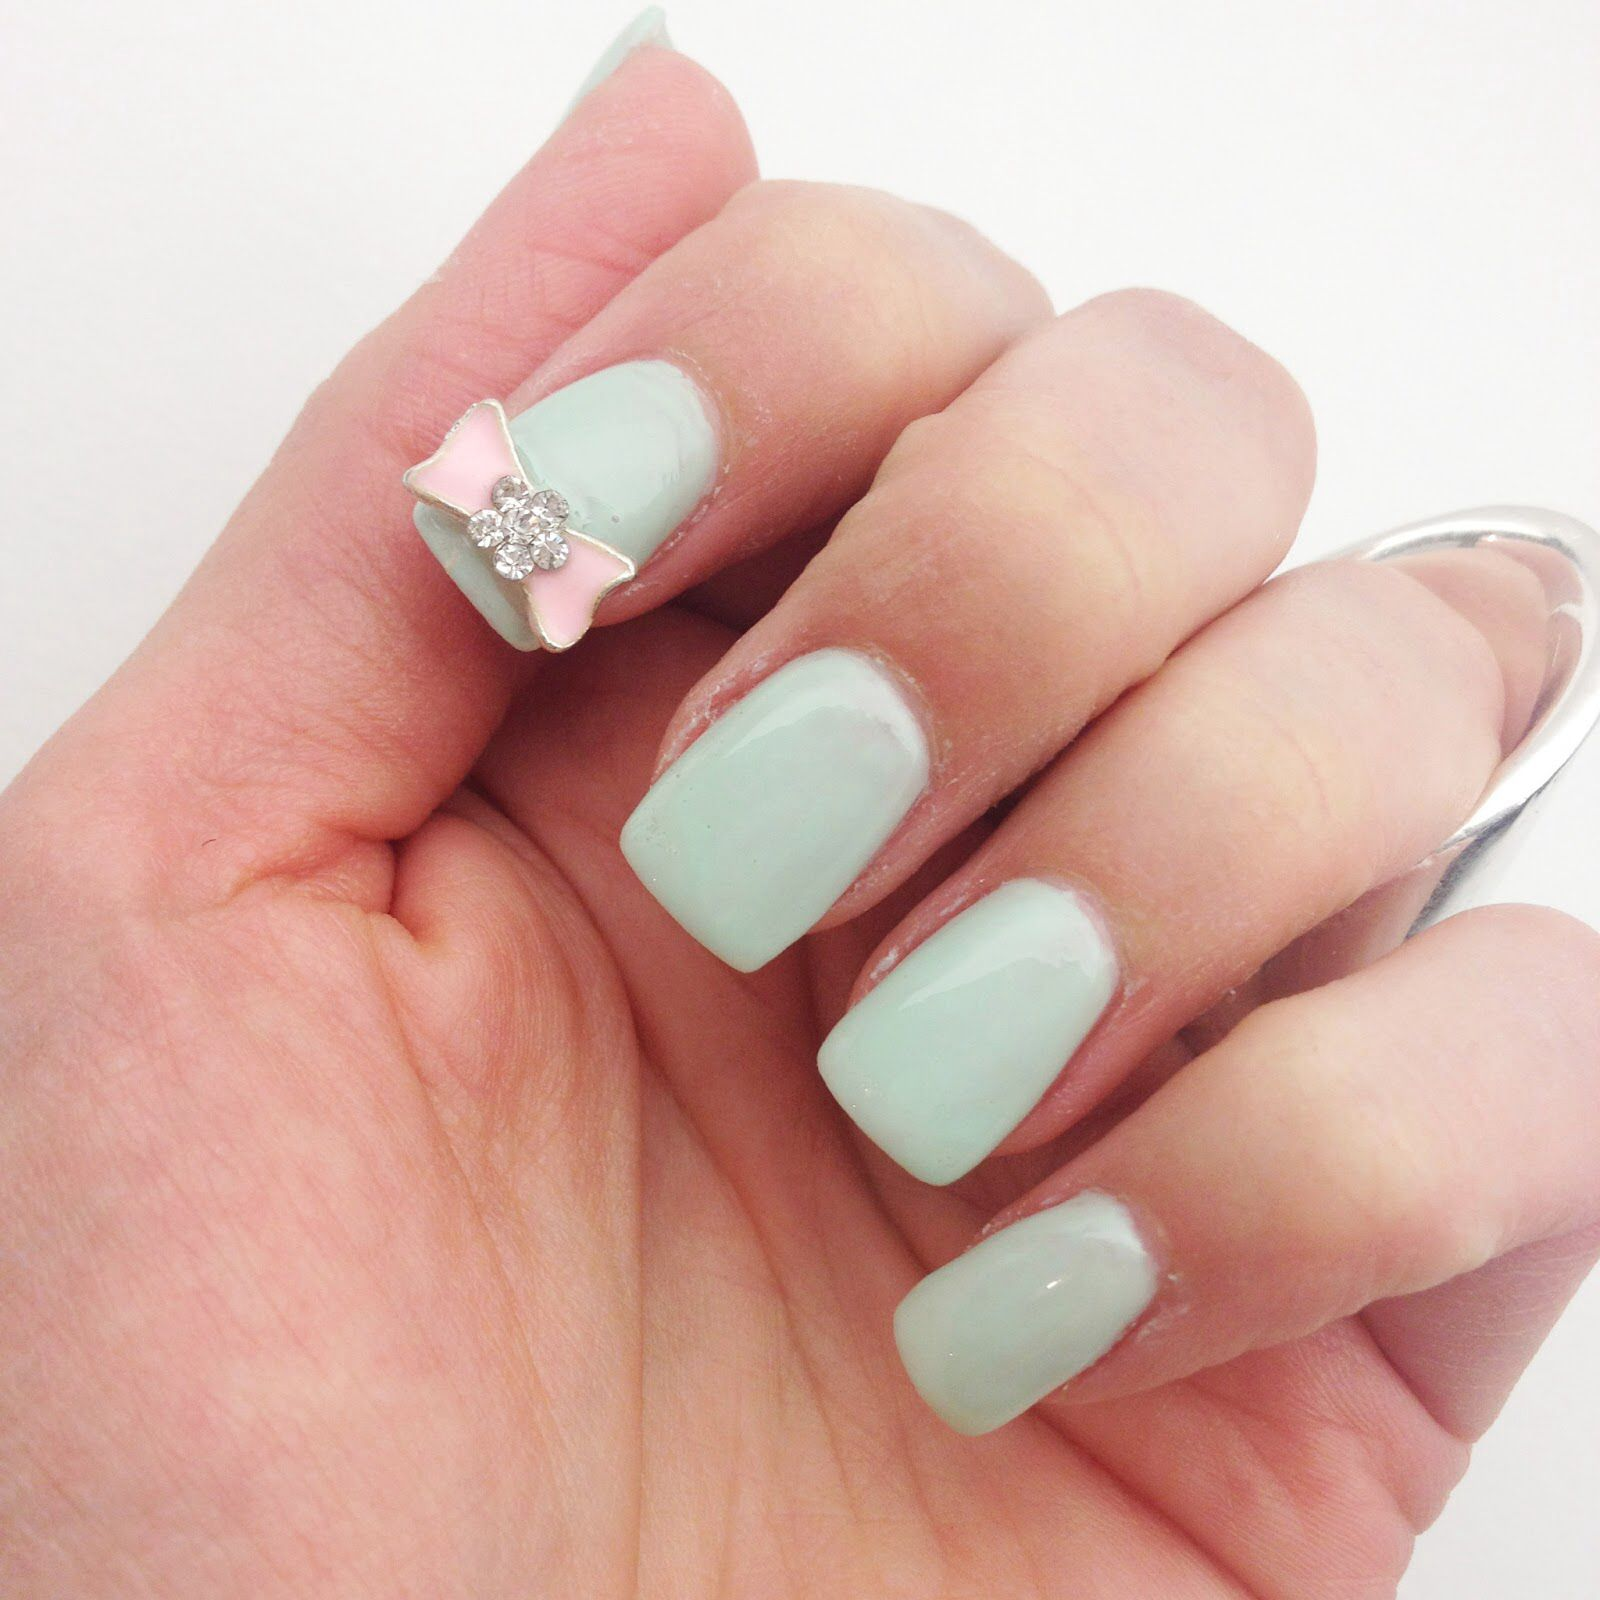 Mint green! So perf | Chic nails | Pinterest | Mint green